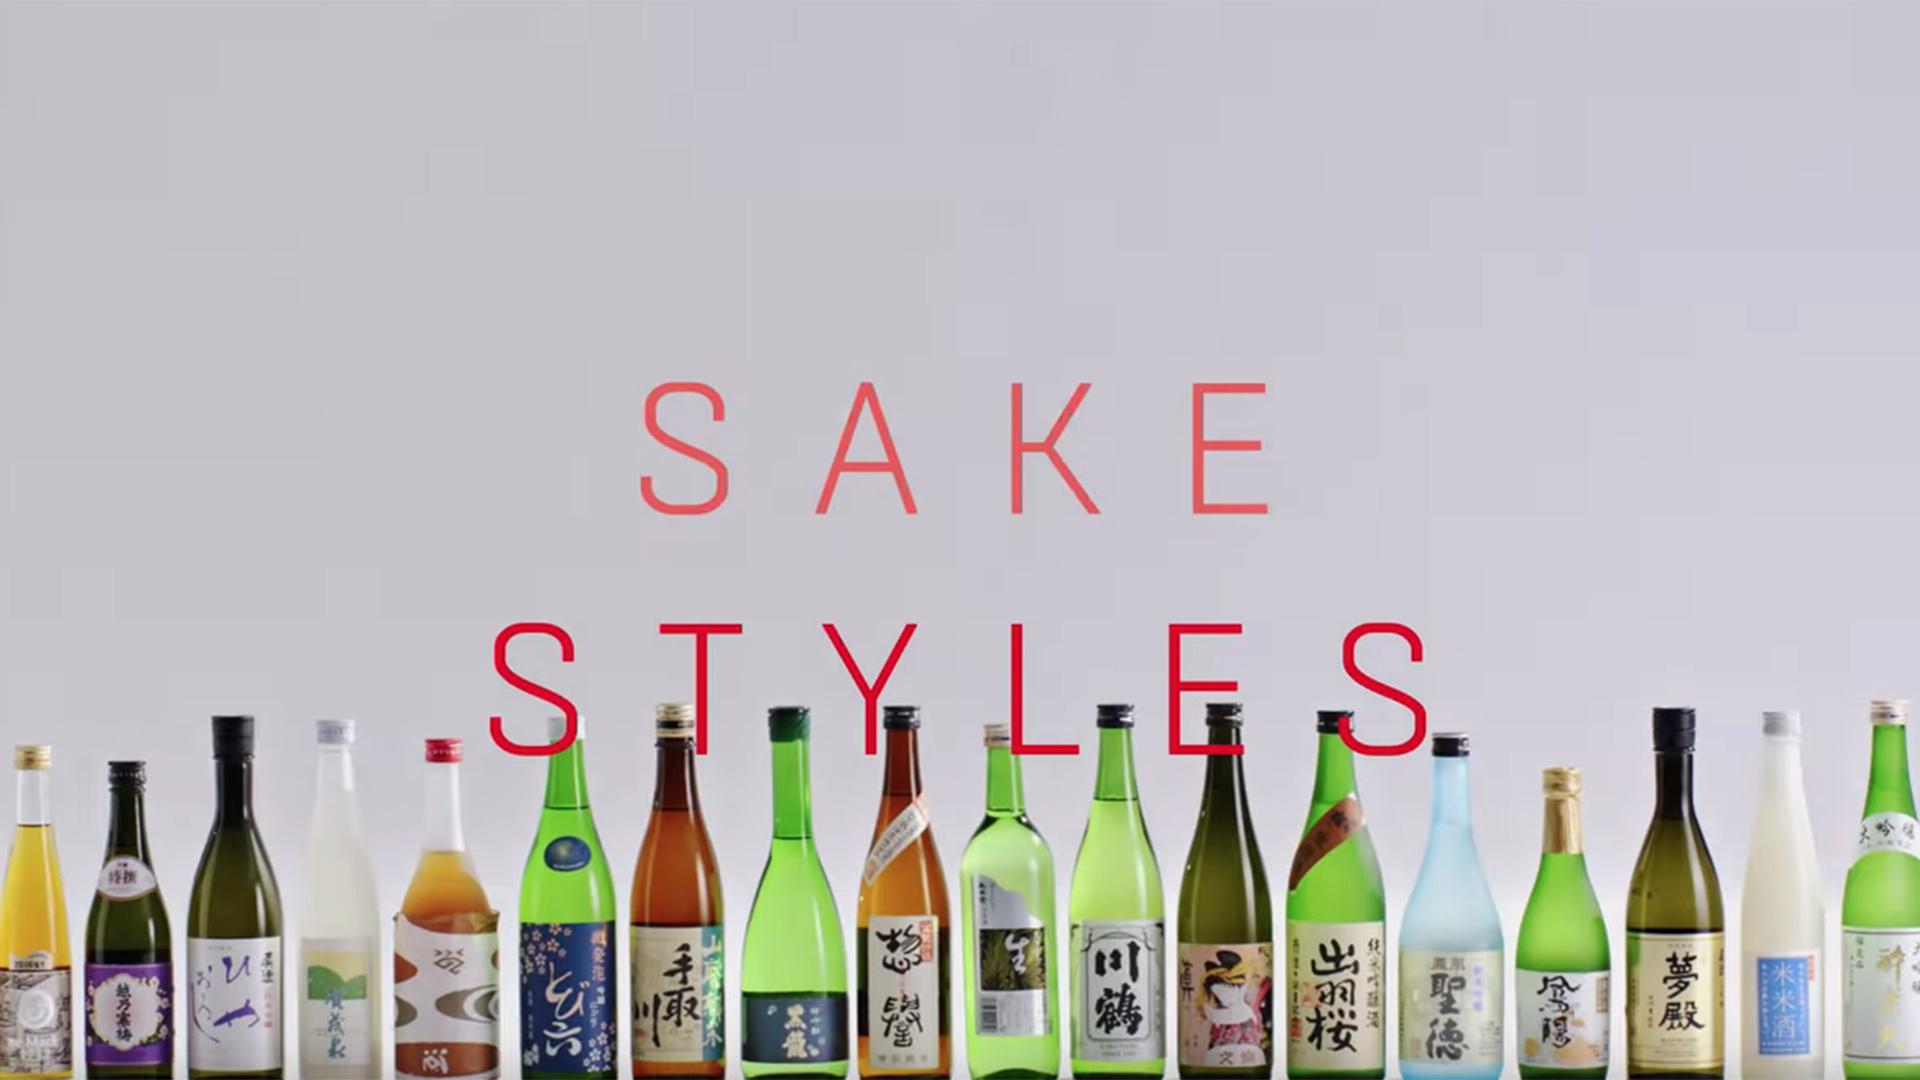 Japan Week 2019: The different sake styles